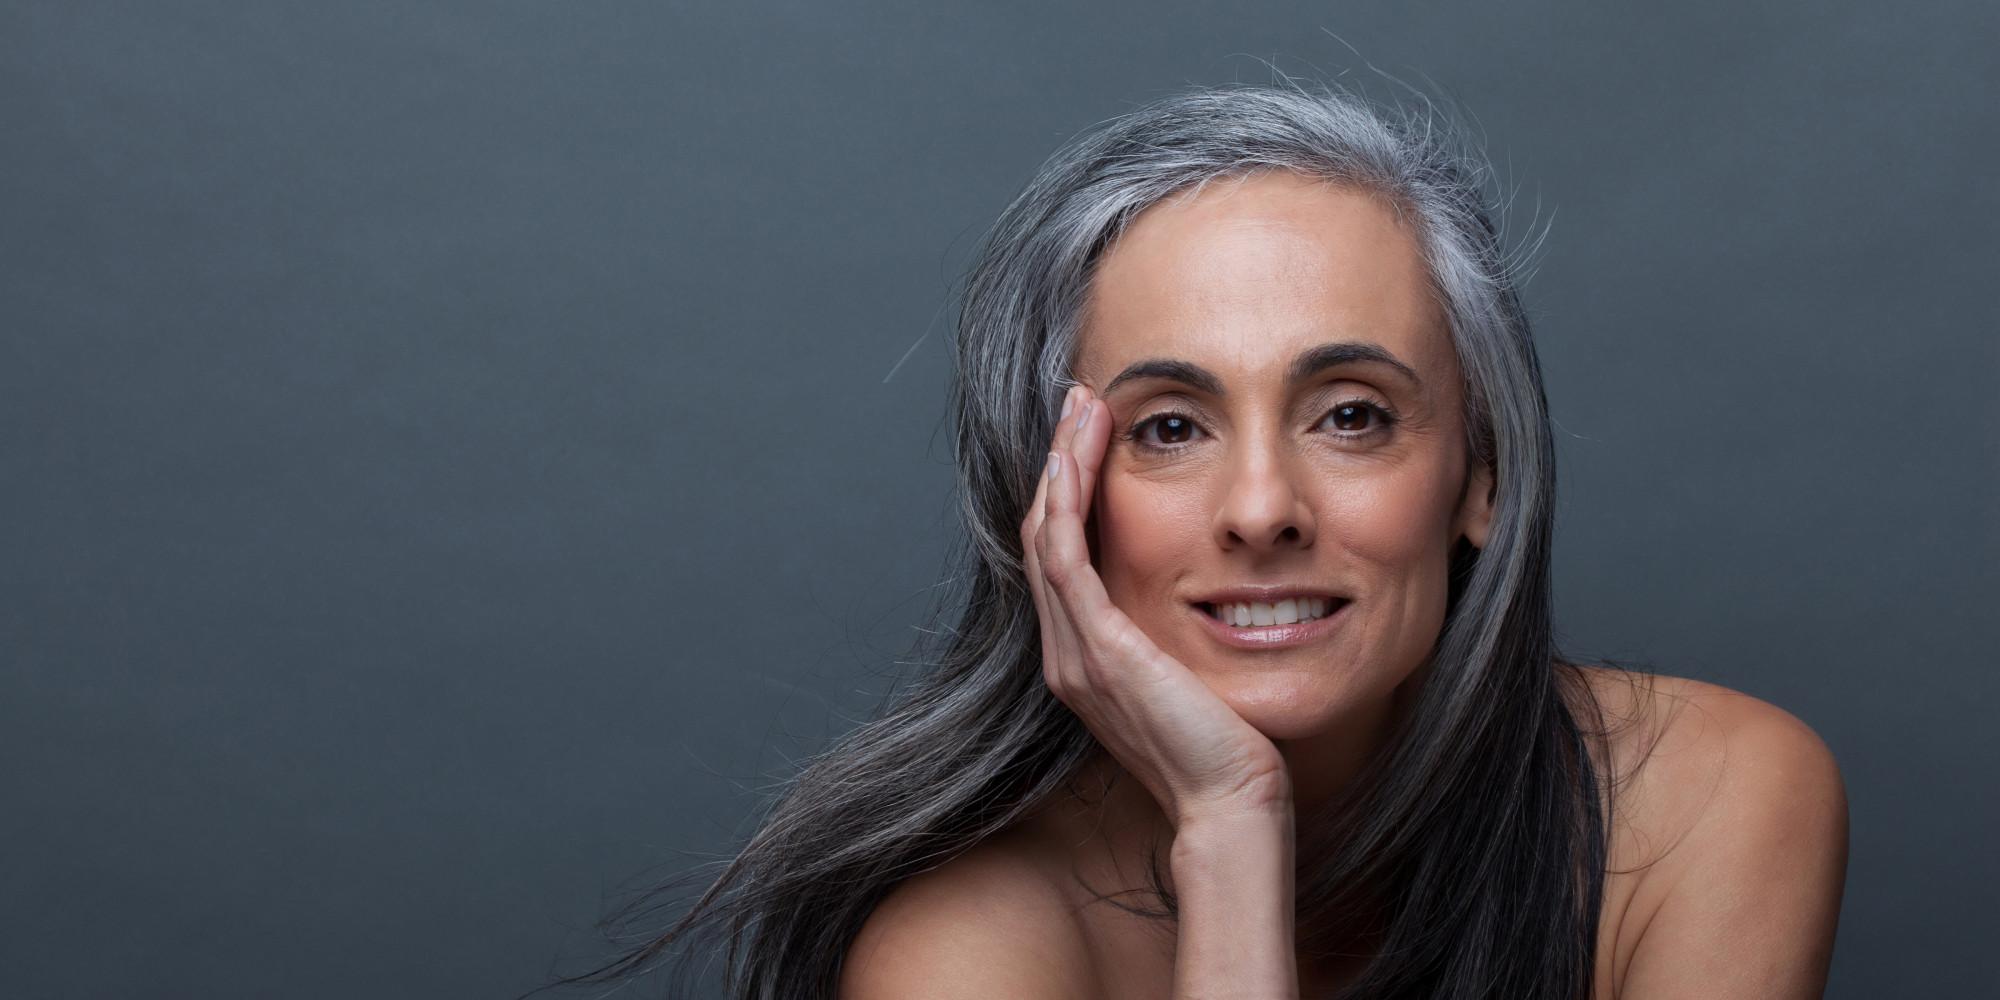 What Age Should I Stop Hrt Or Estrogen-5077